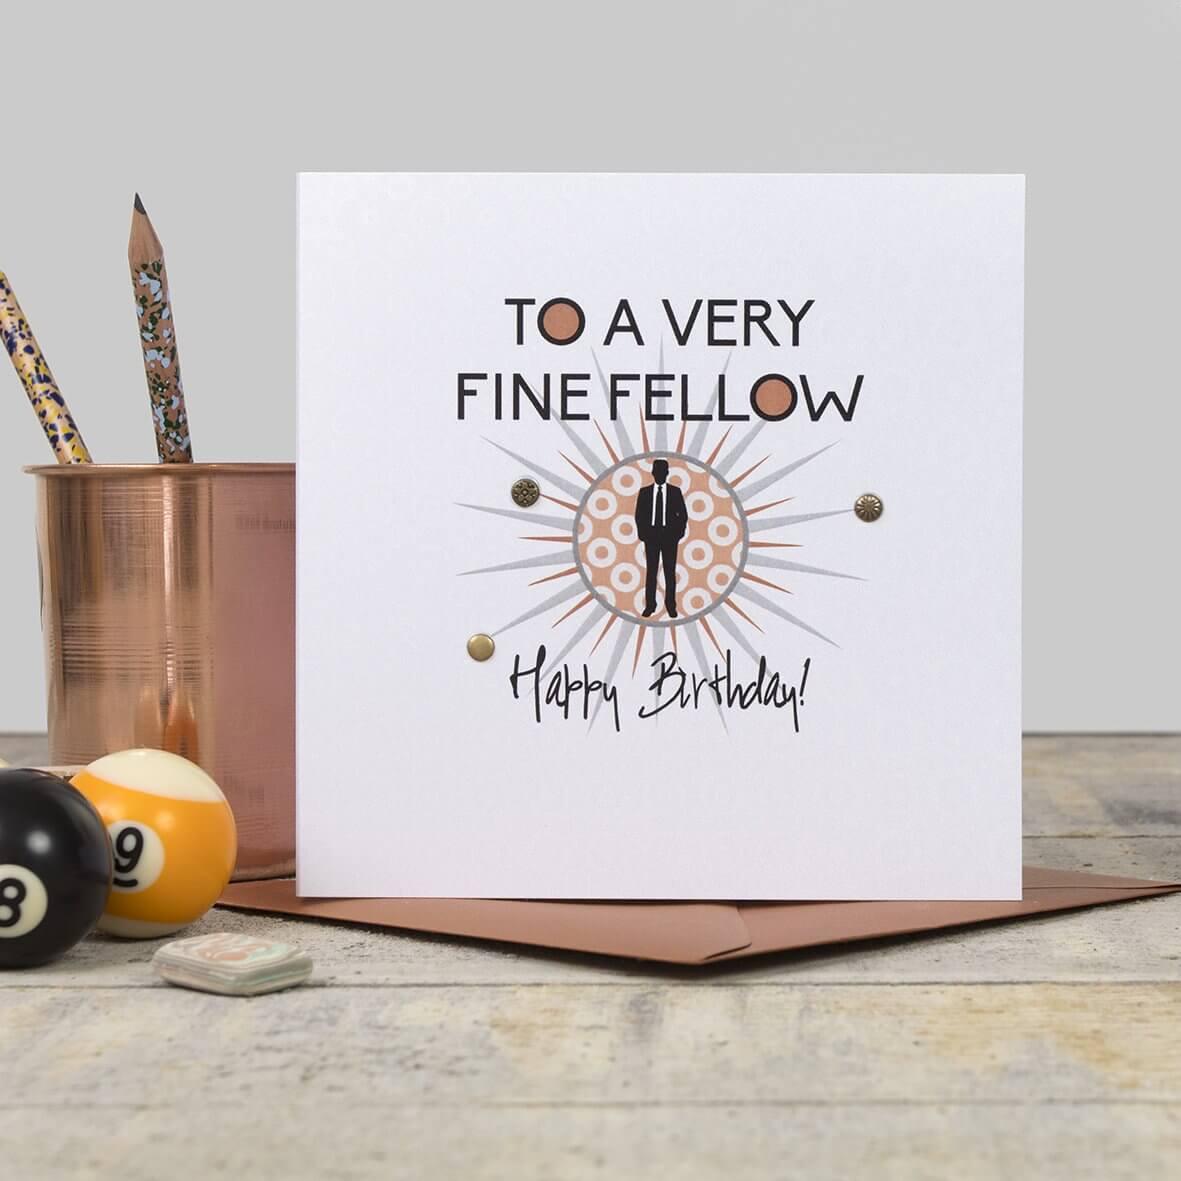 To a very Fine Fellow - Happy Birthday